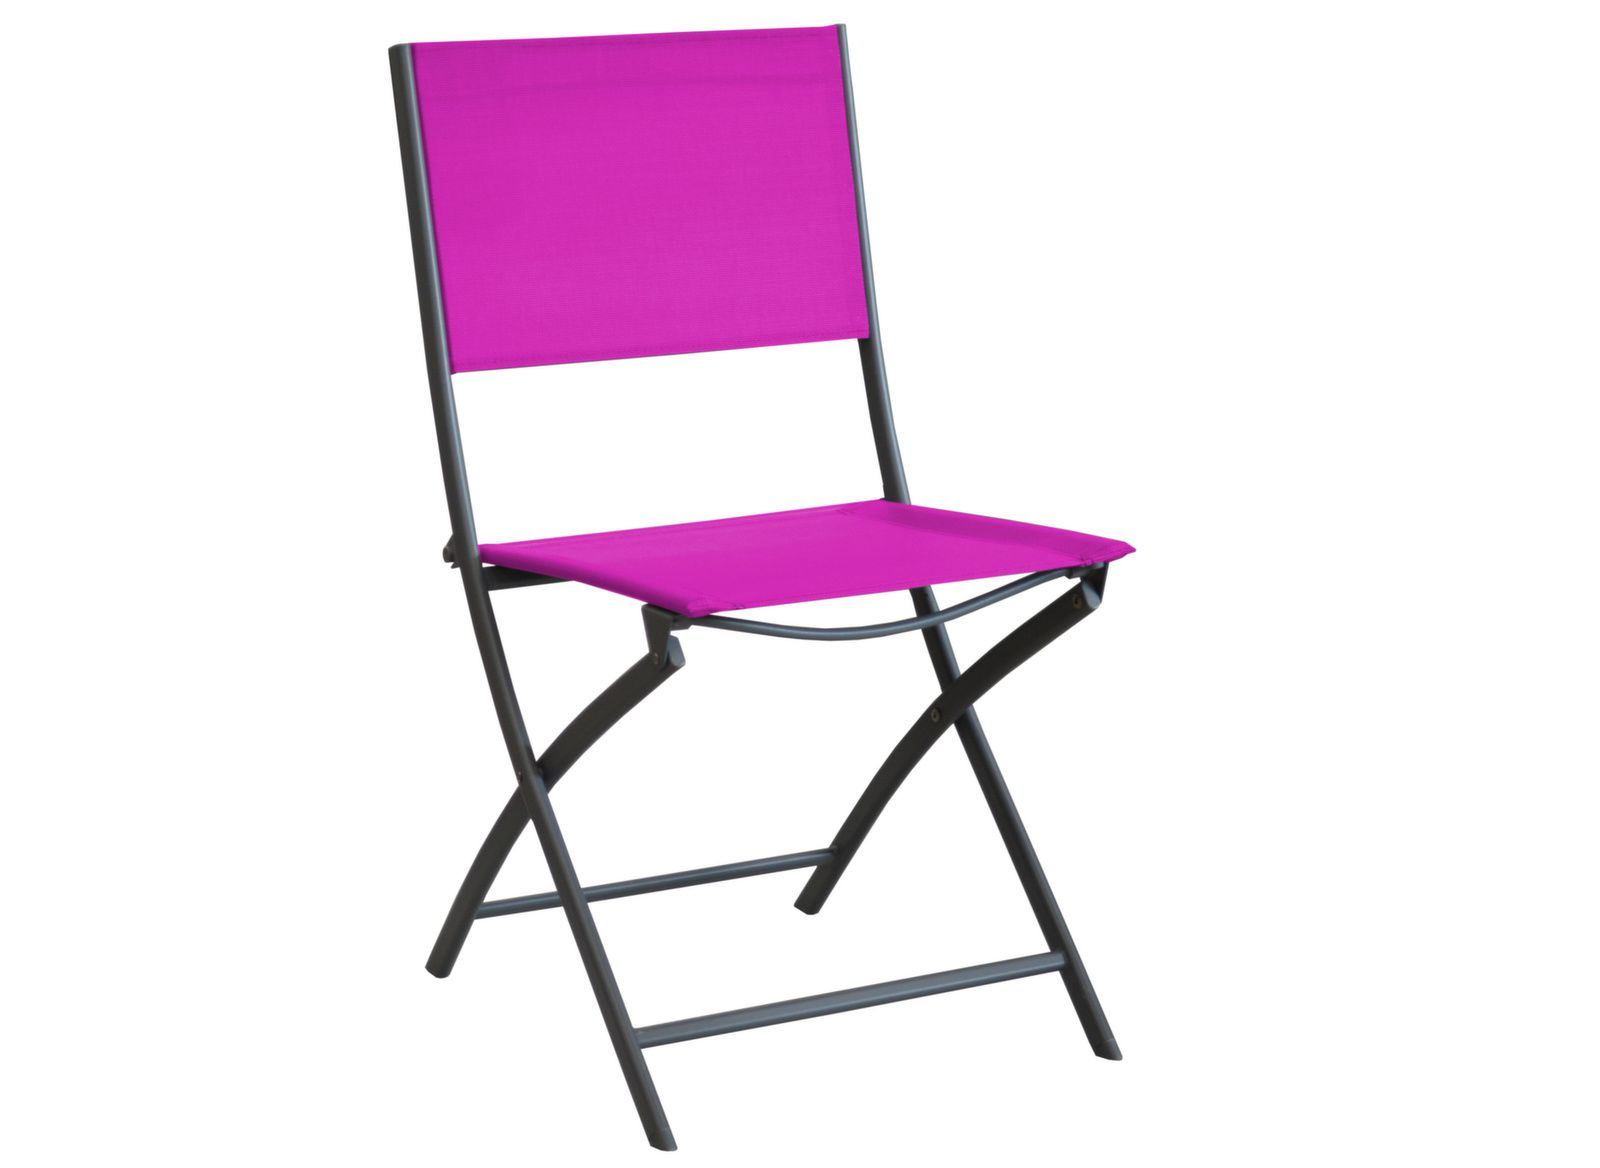 chaise pliante dream